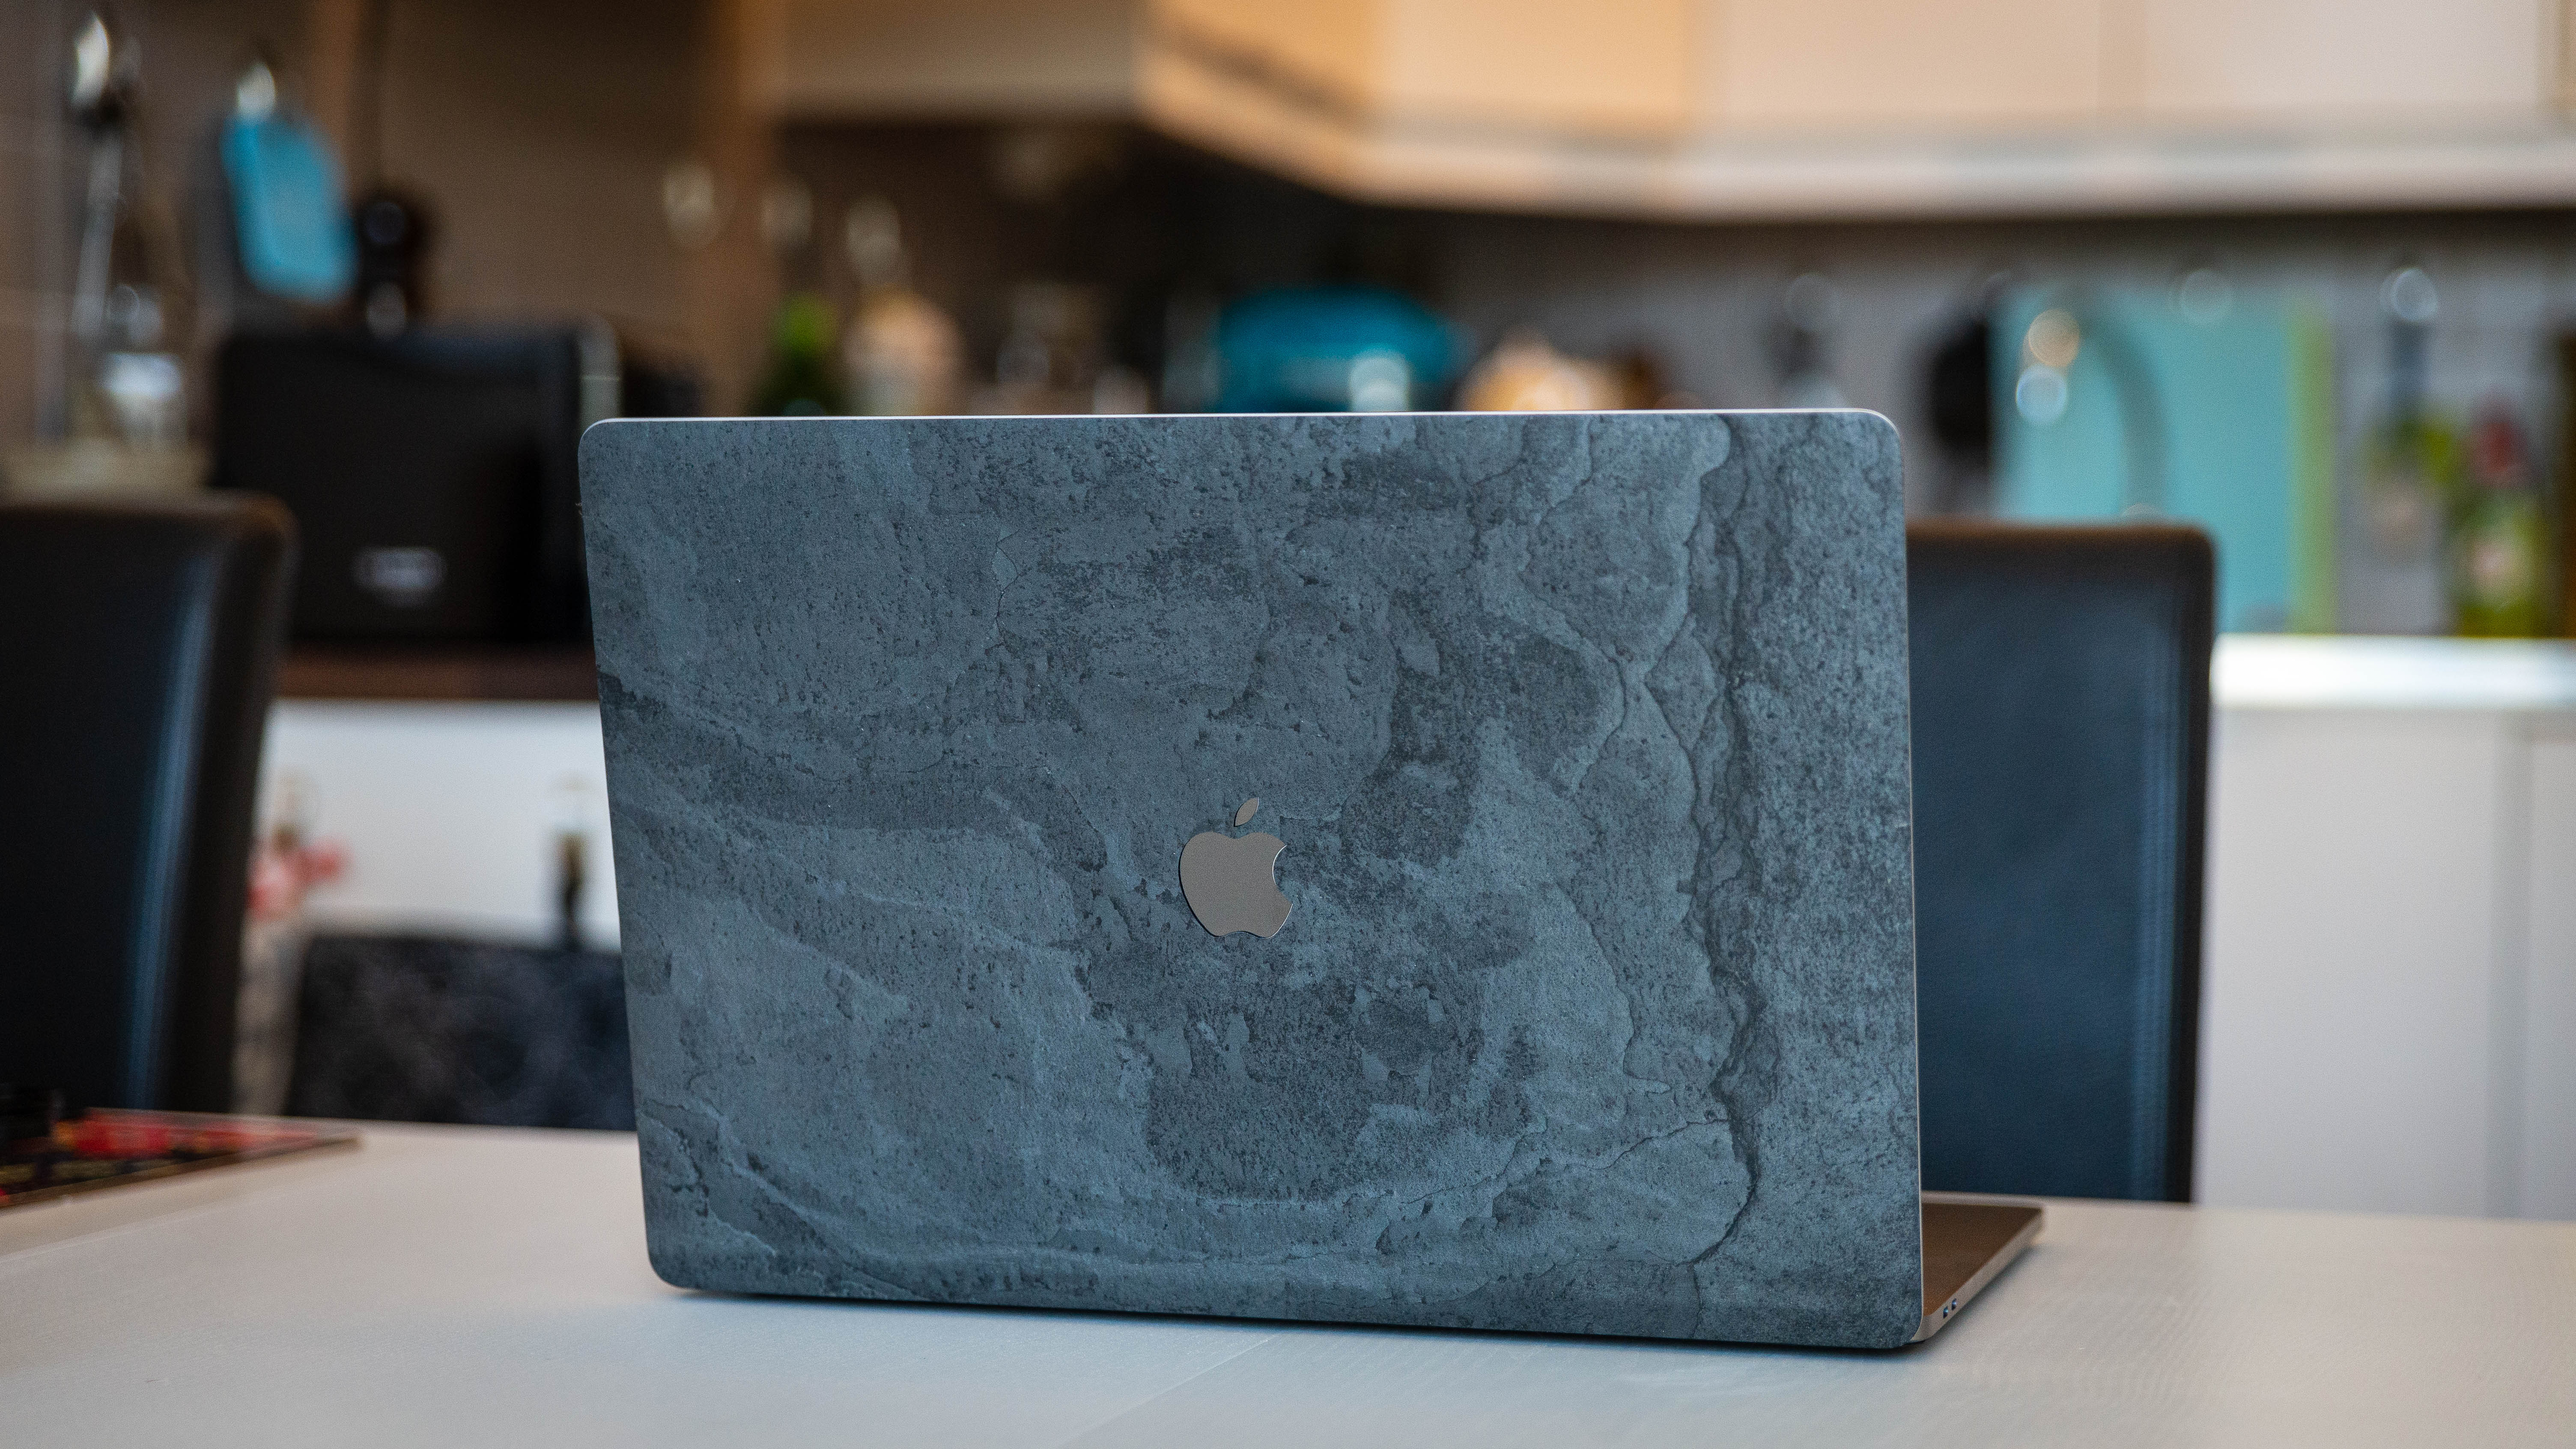 MacBook Pro 16 inch with Roxxlyn slate skin